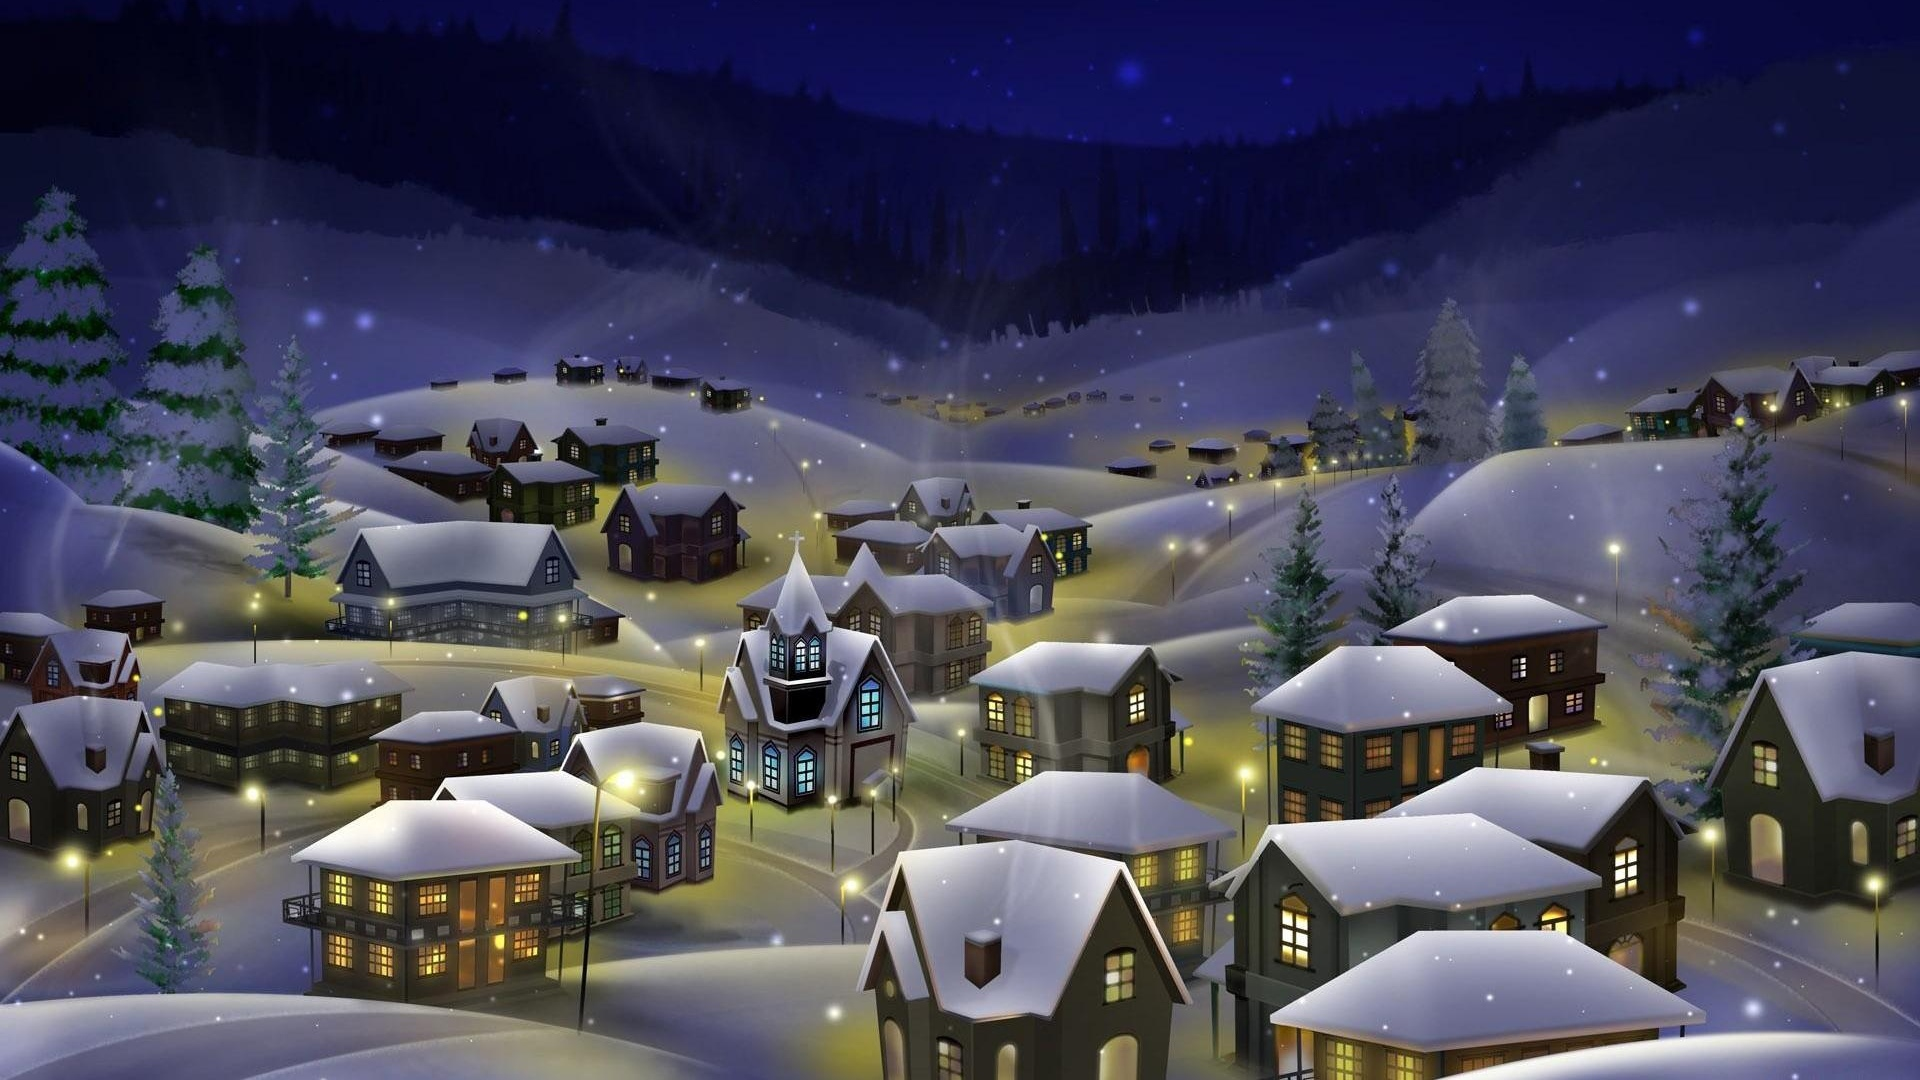 herunterladen 1920x1080 full hd hintergrundbilder winter. Black Bedroom Furniture Sets. Home Design Ideas